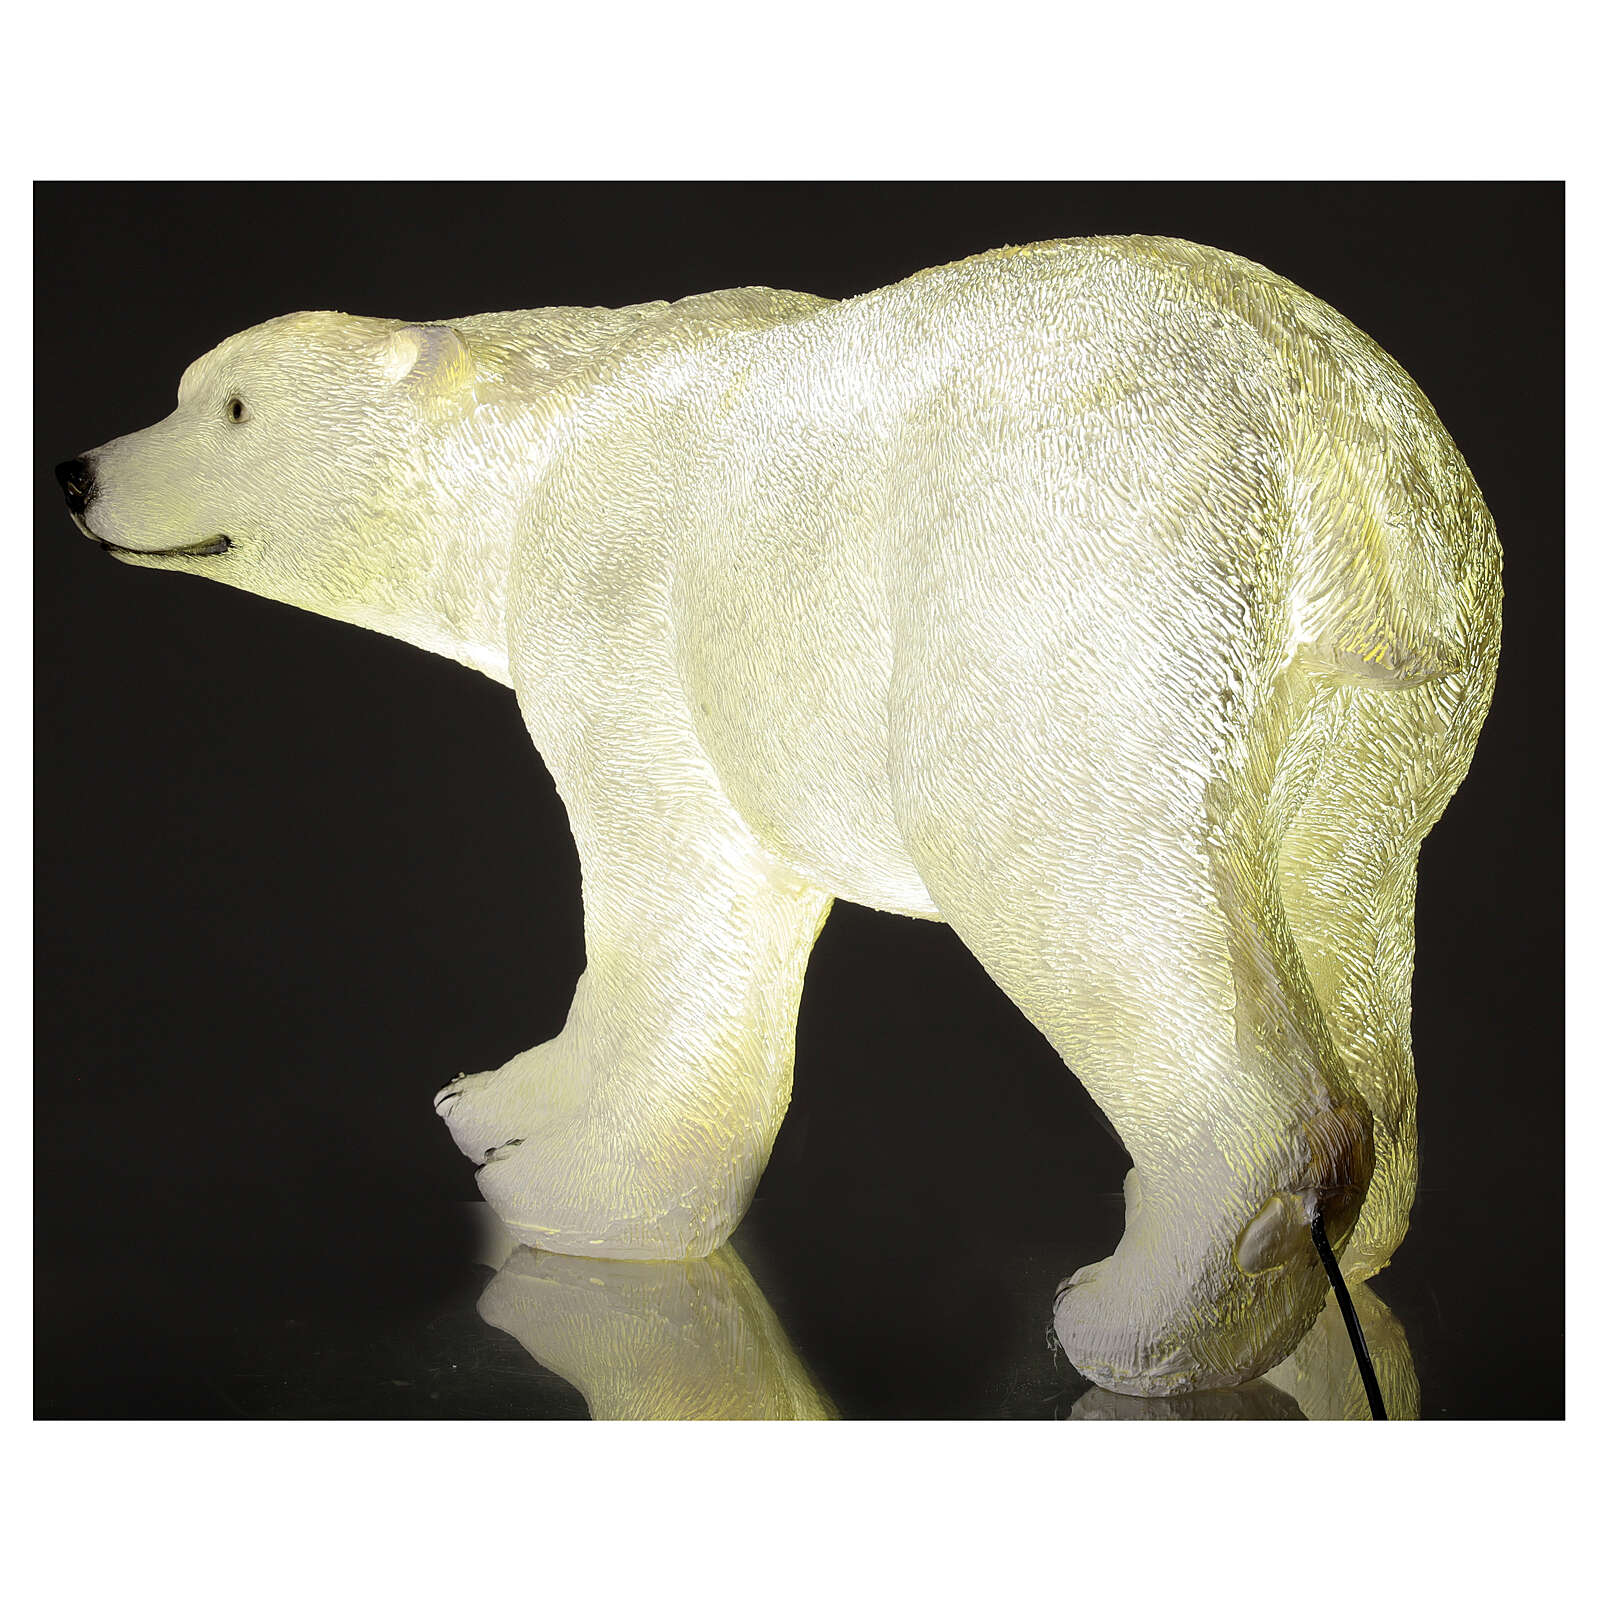 Orso polare led bianco luce Natale 35x55x30 cm 3